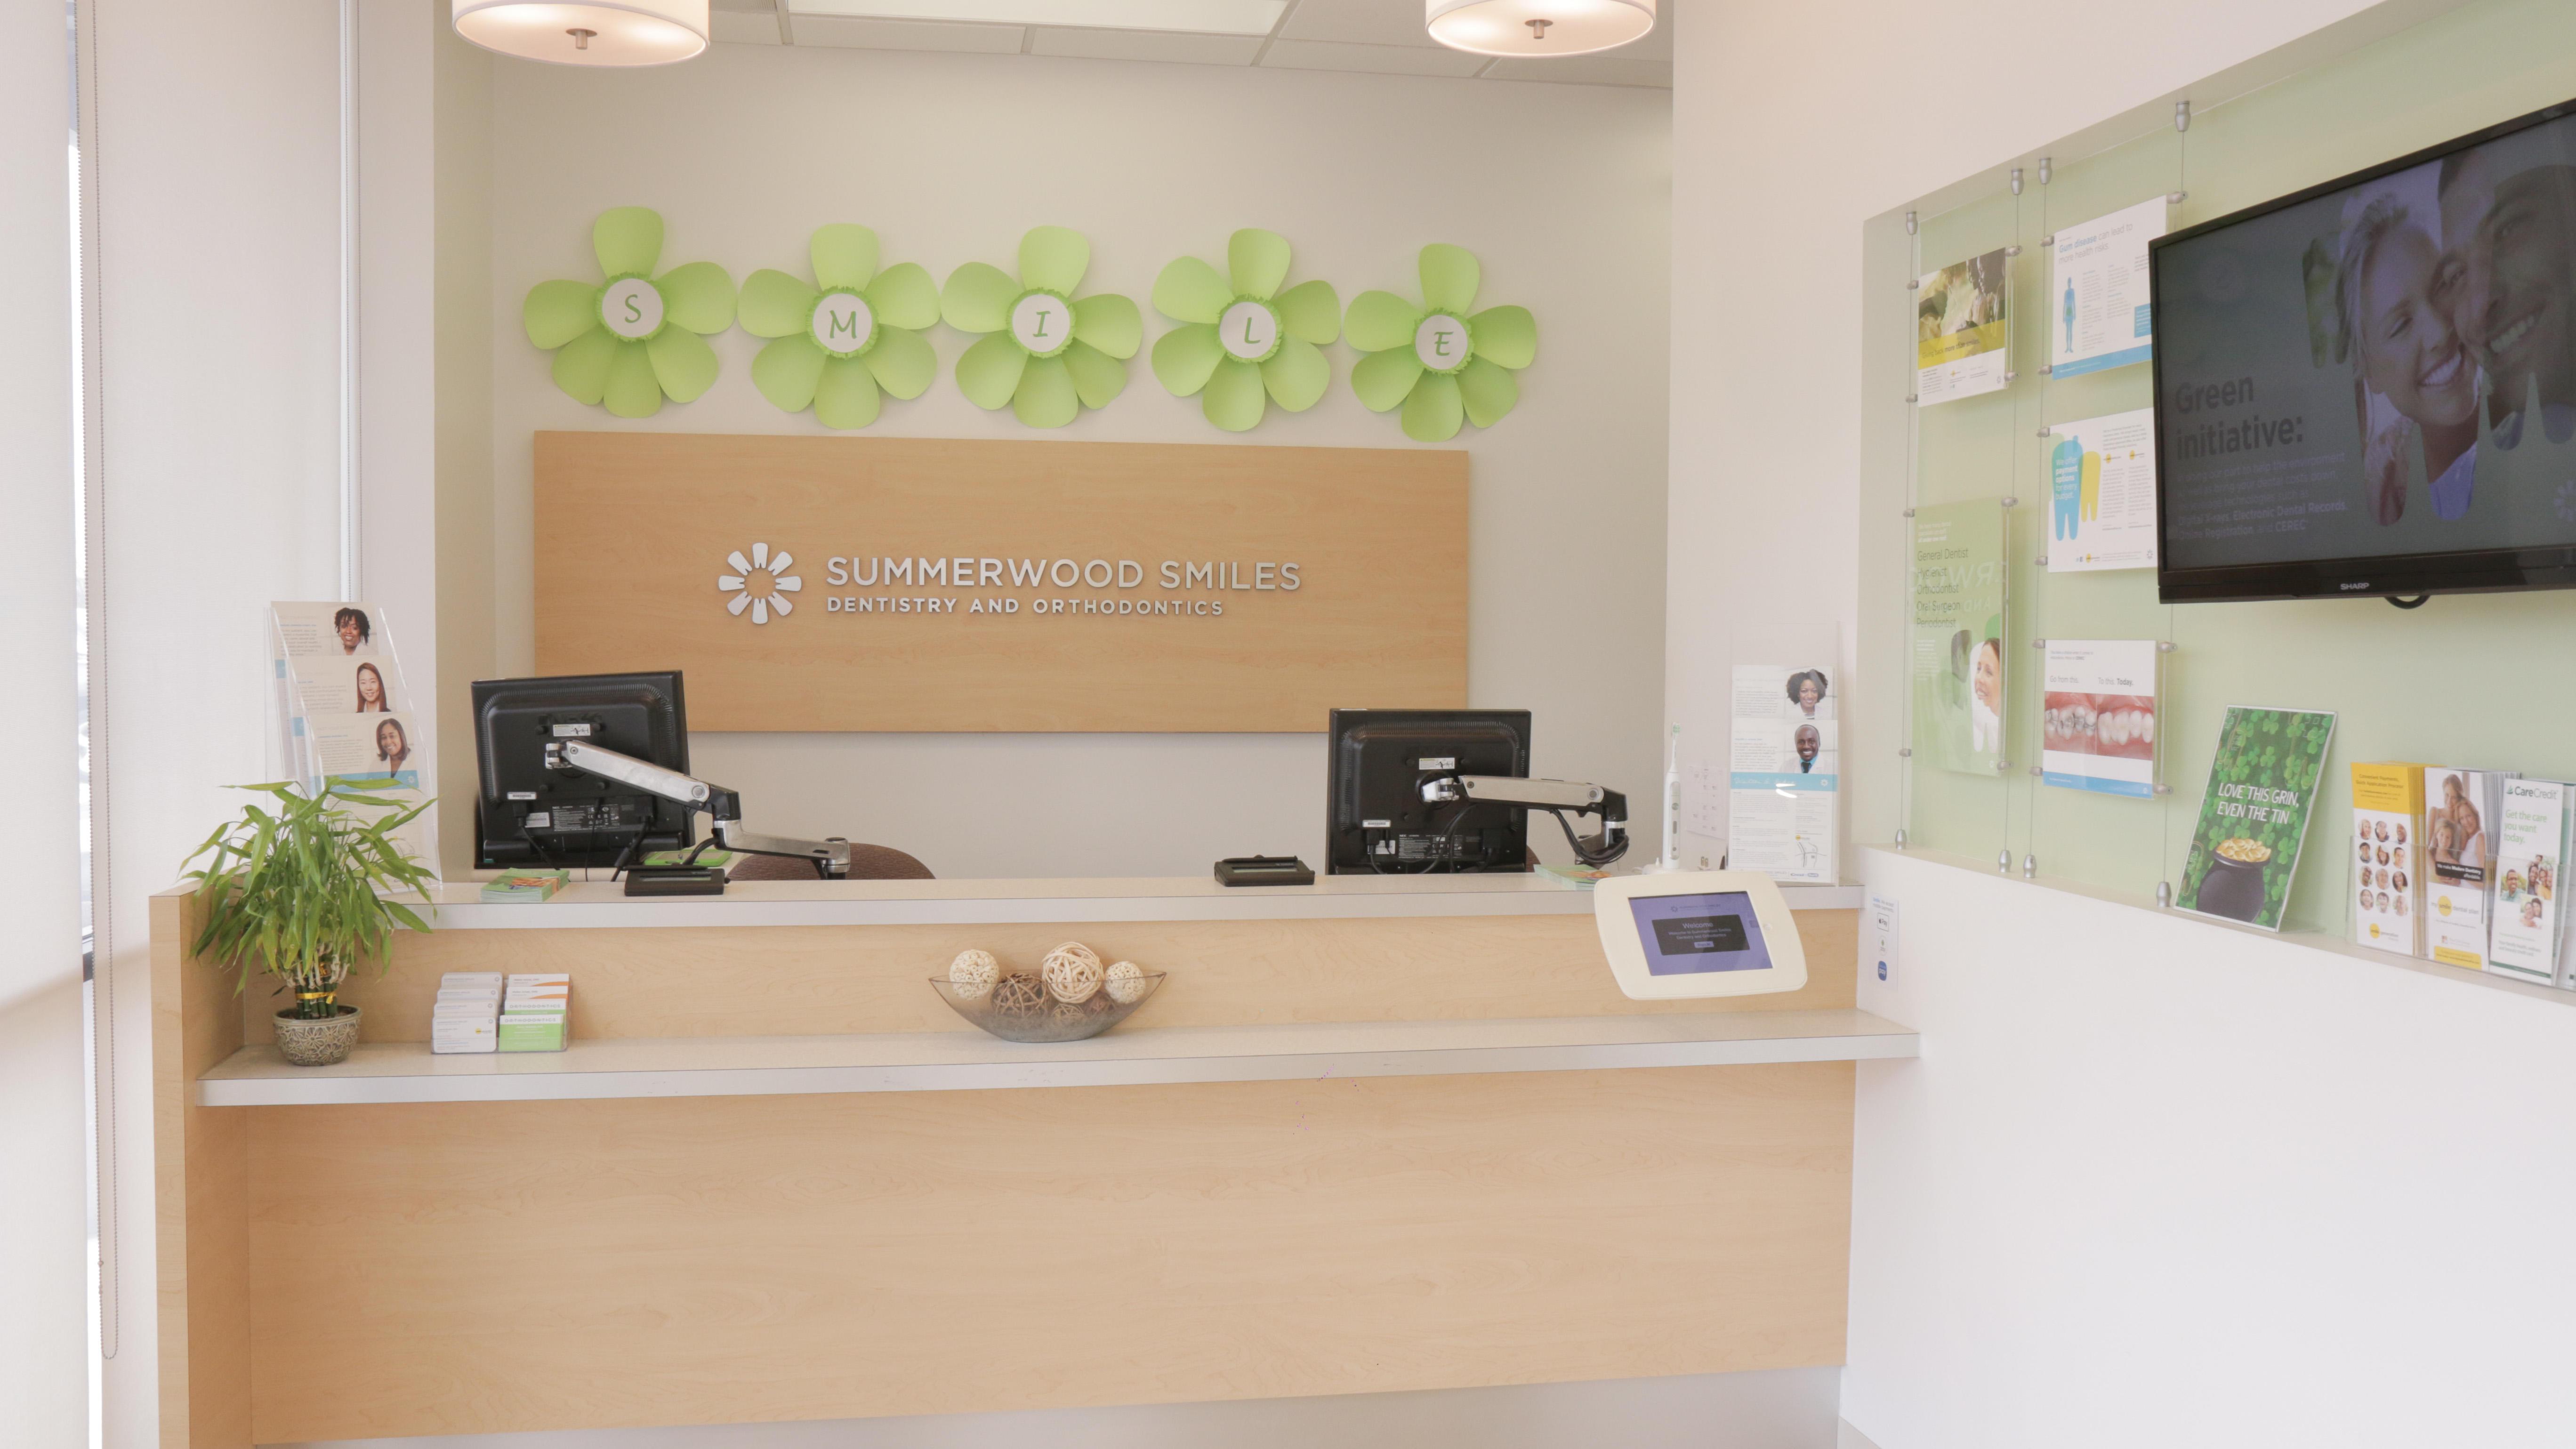 Summerwood Smiles Dentistry and Orthodontics image 6